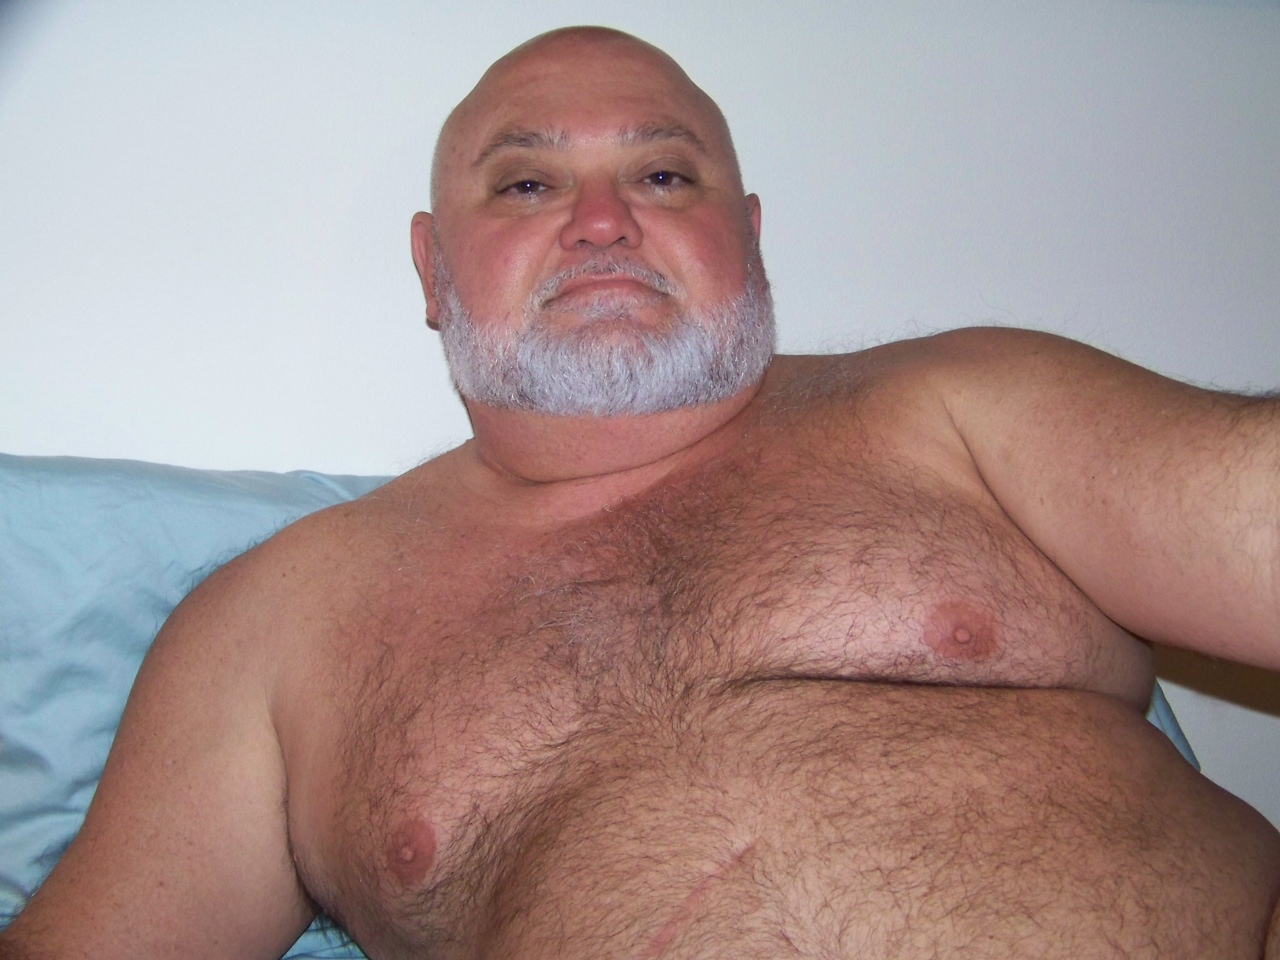 Naked vk boy nude